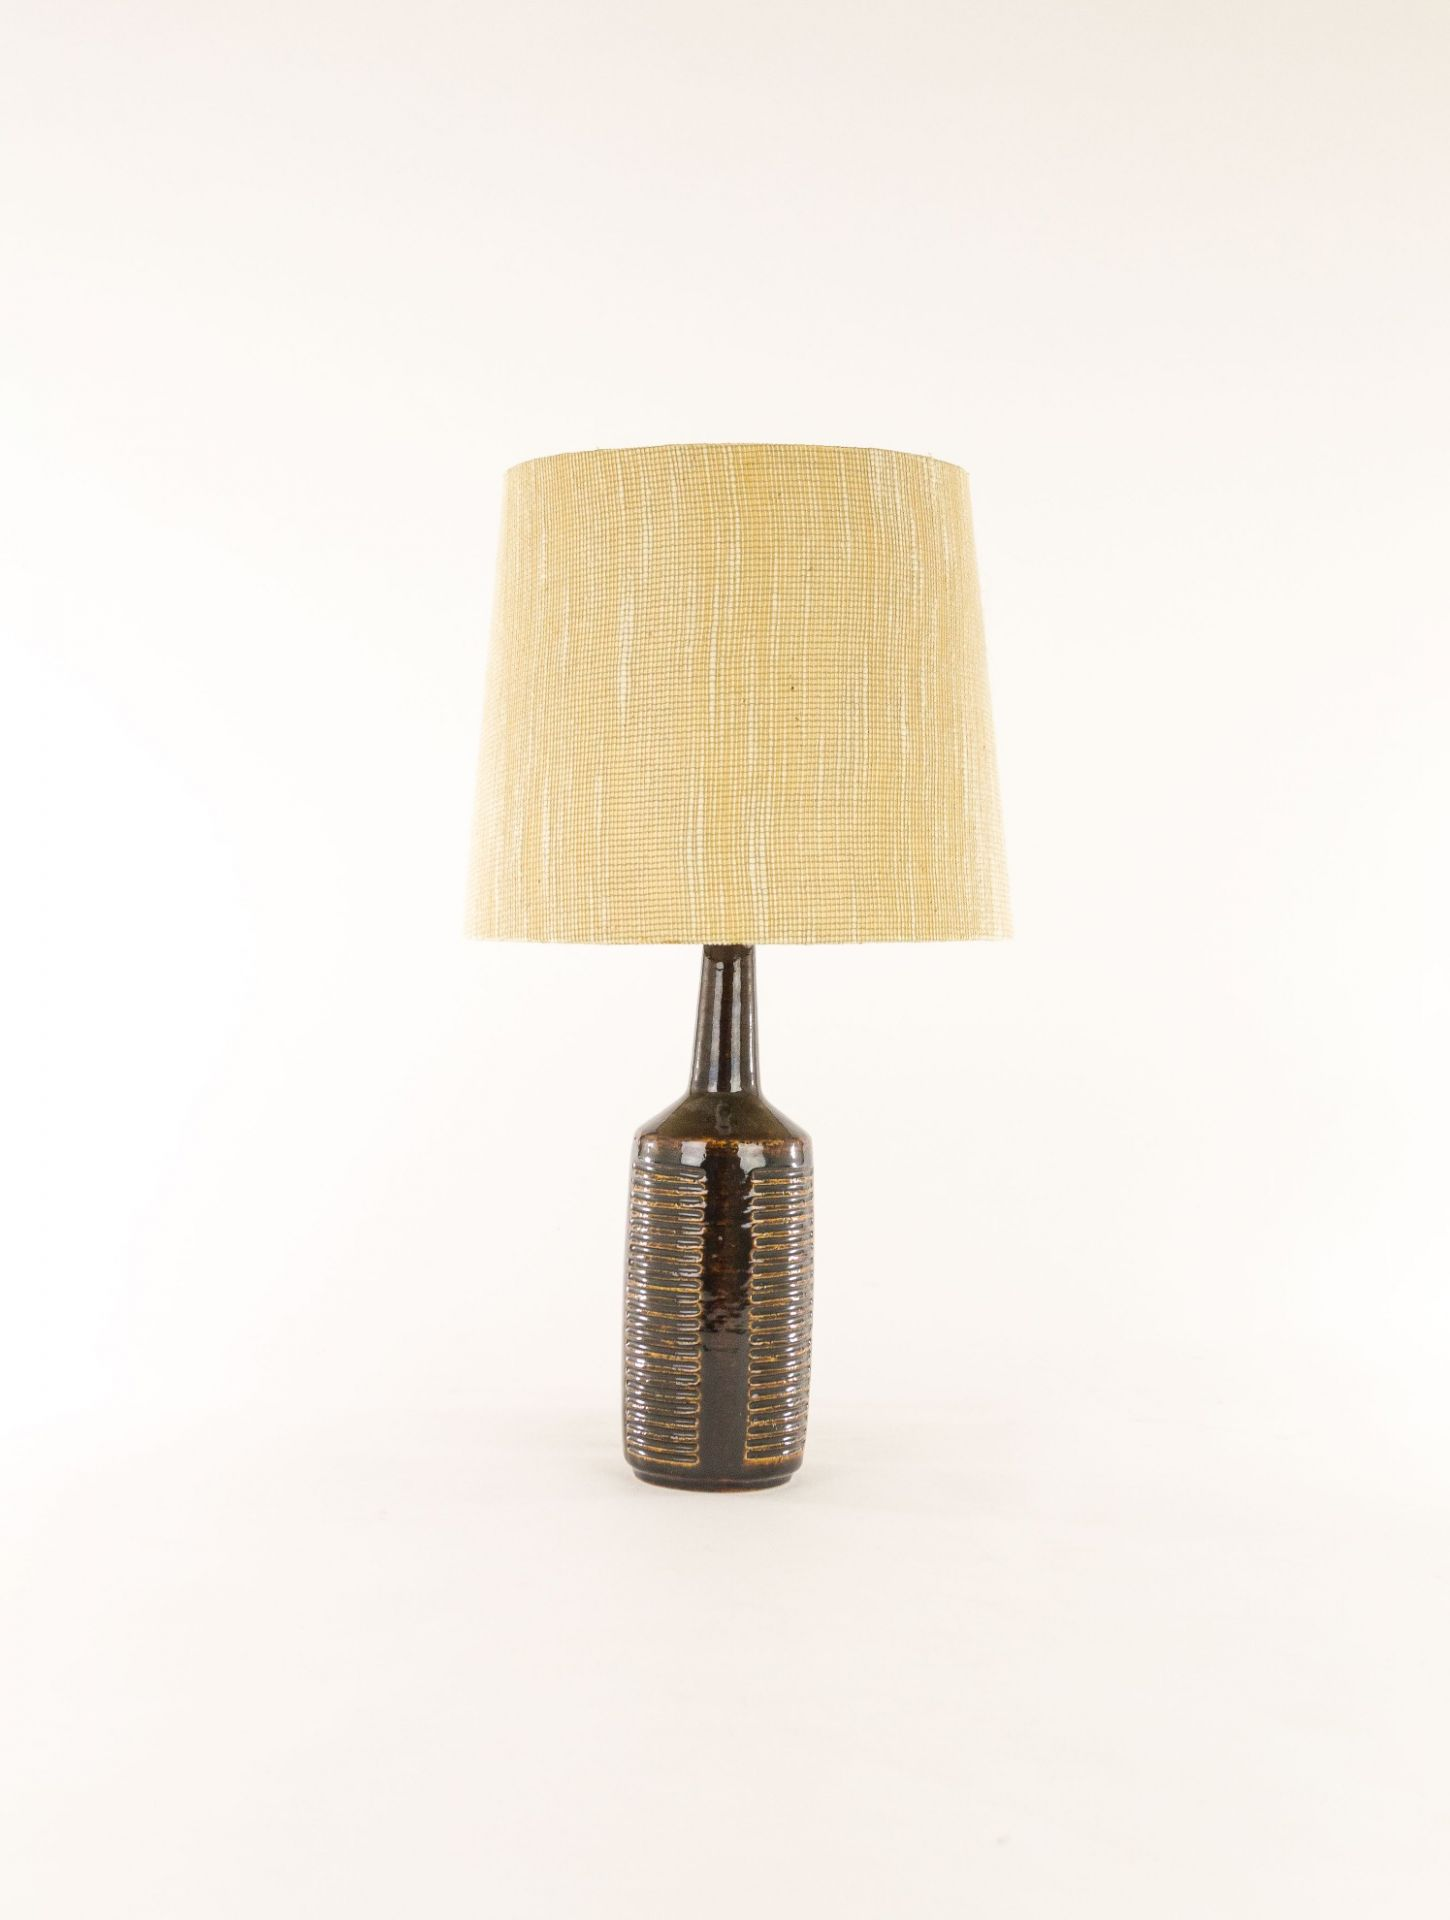 Collection Palshus table lamps model DL/30 by Annelise and Per Linnemann-Schmidt